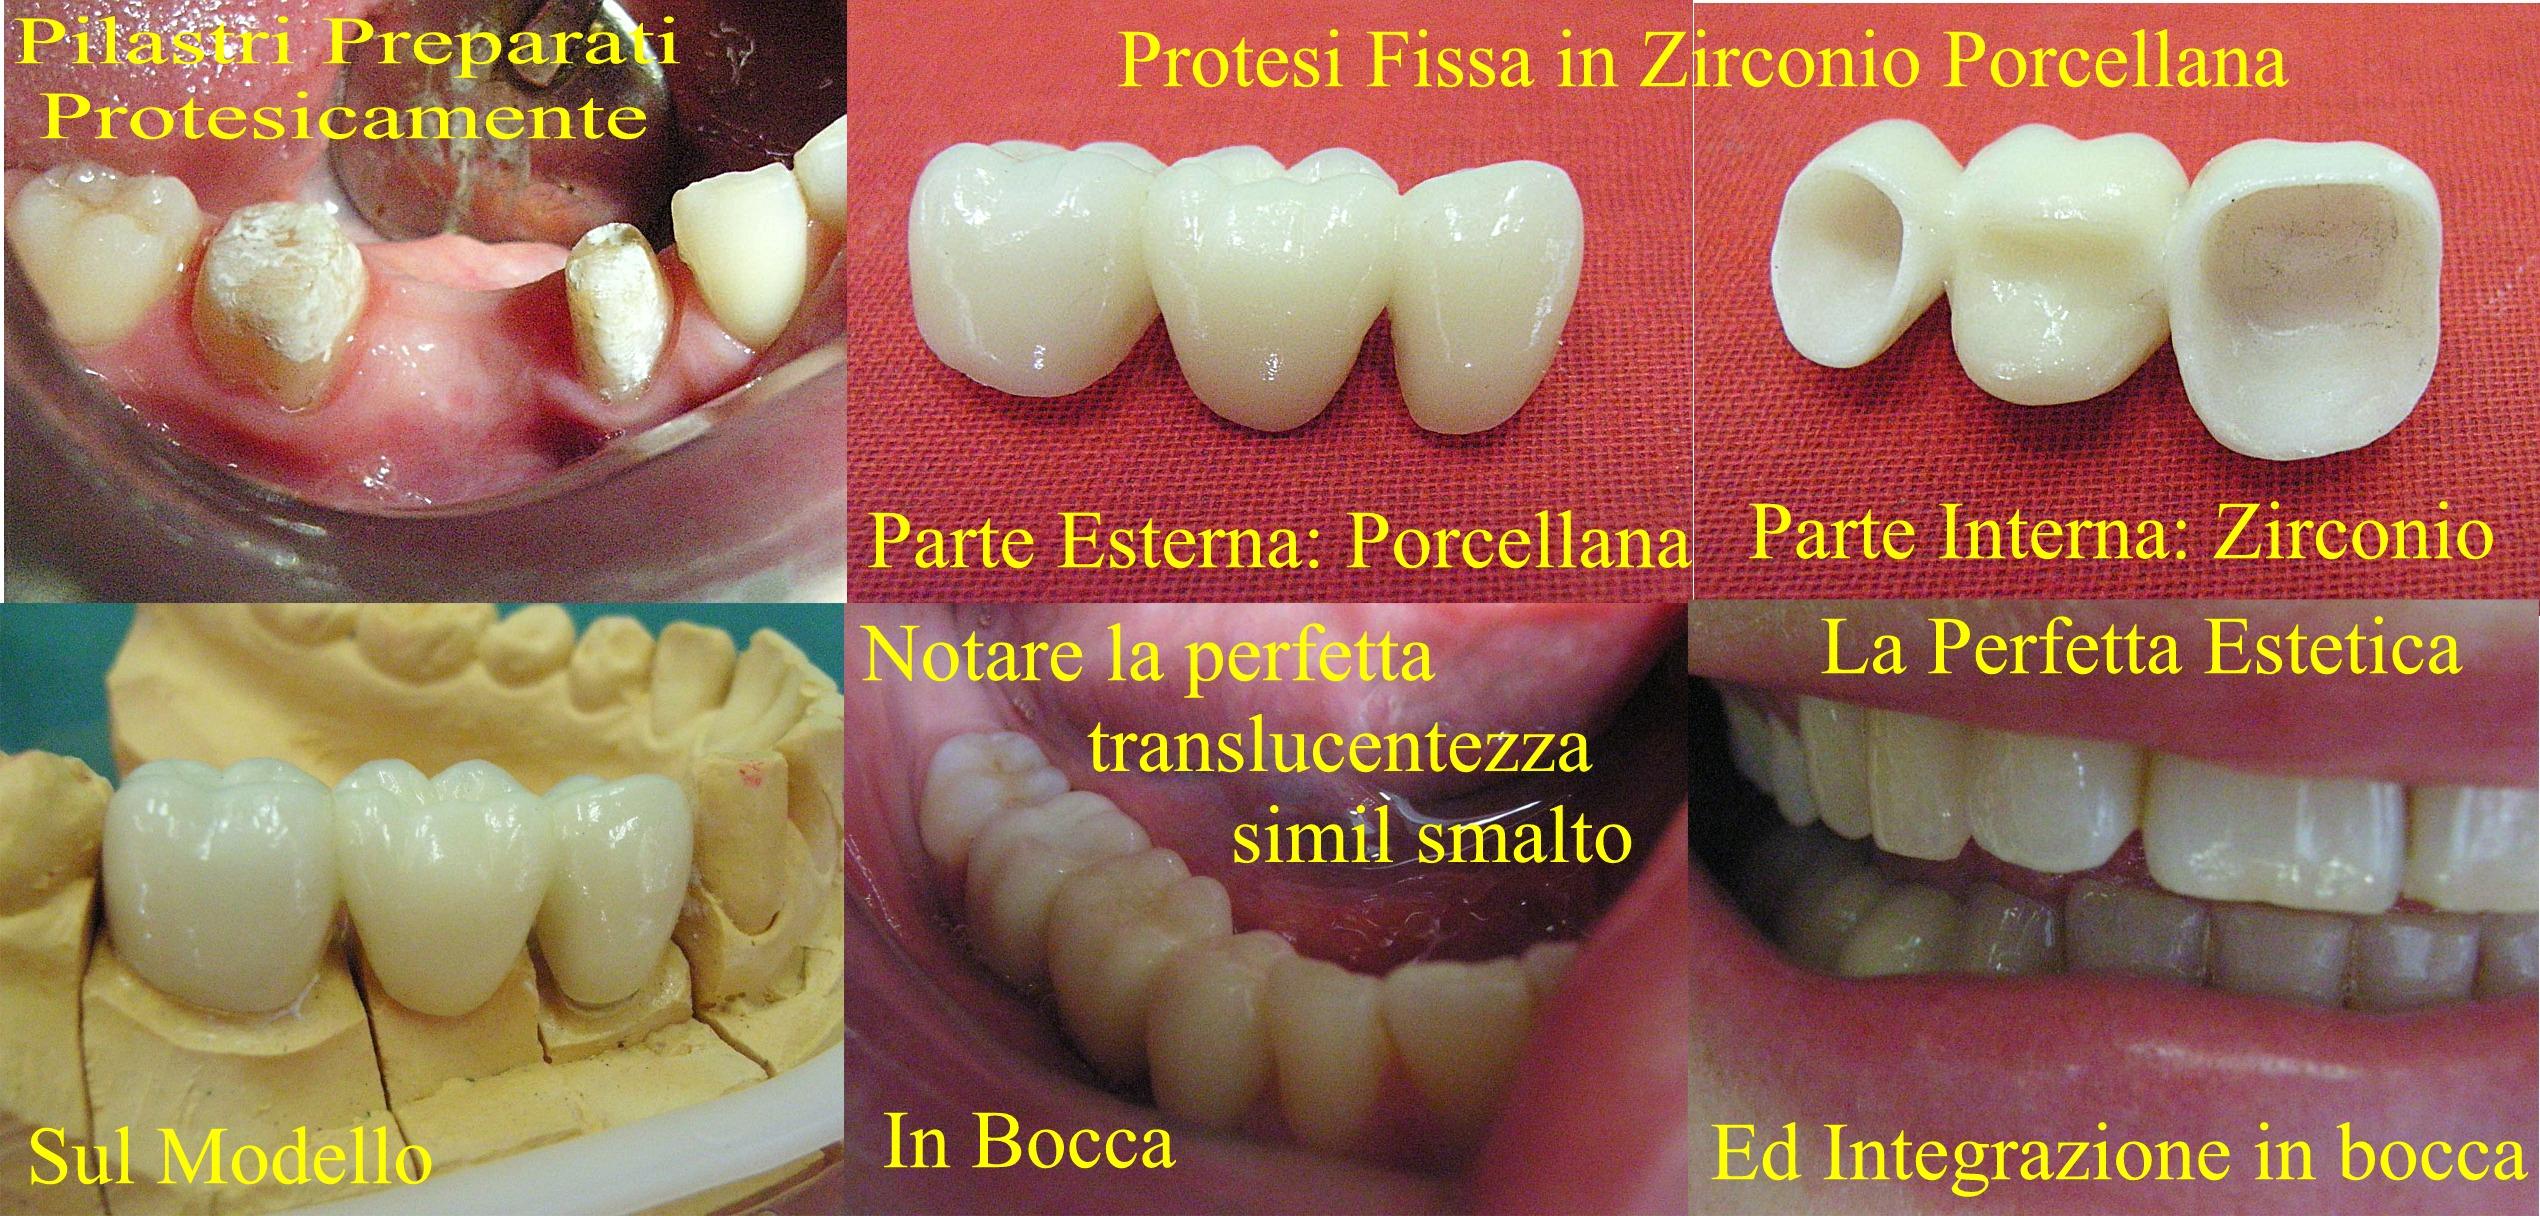 Valerio280711.jpg